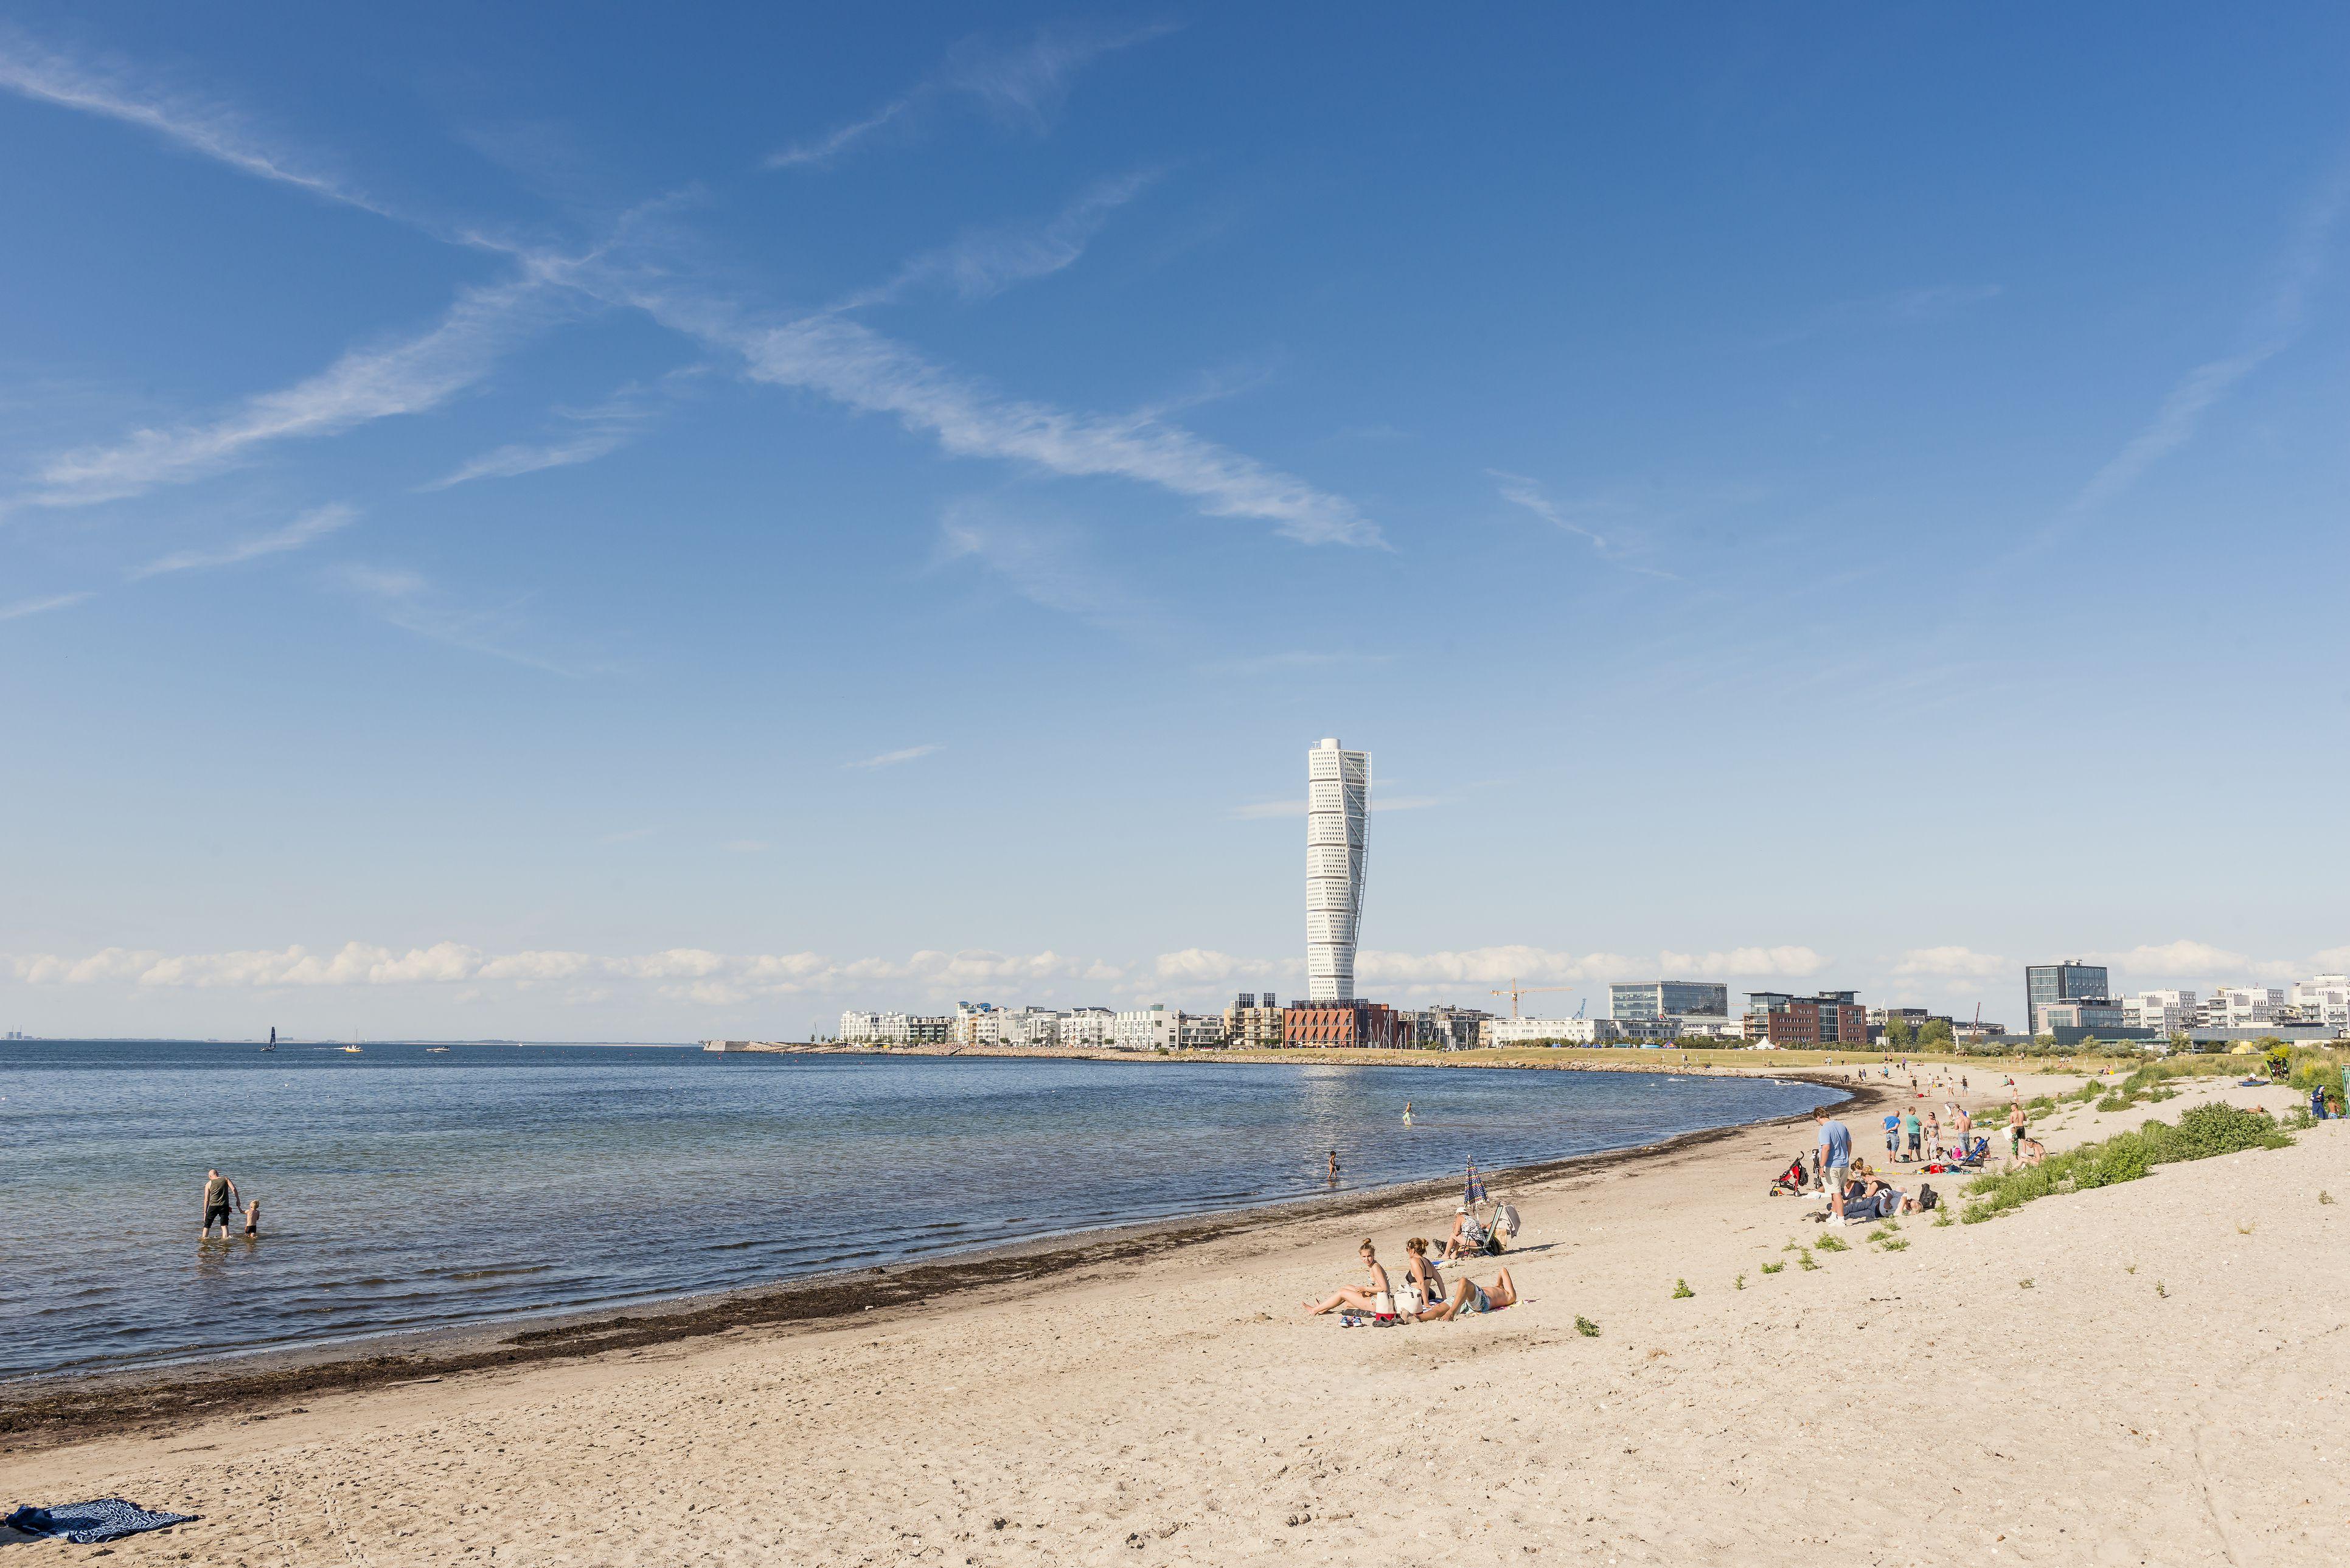 'Sweden, Skane, Malmo, Ribersborg, Coastline with Turning Torso in background'